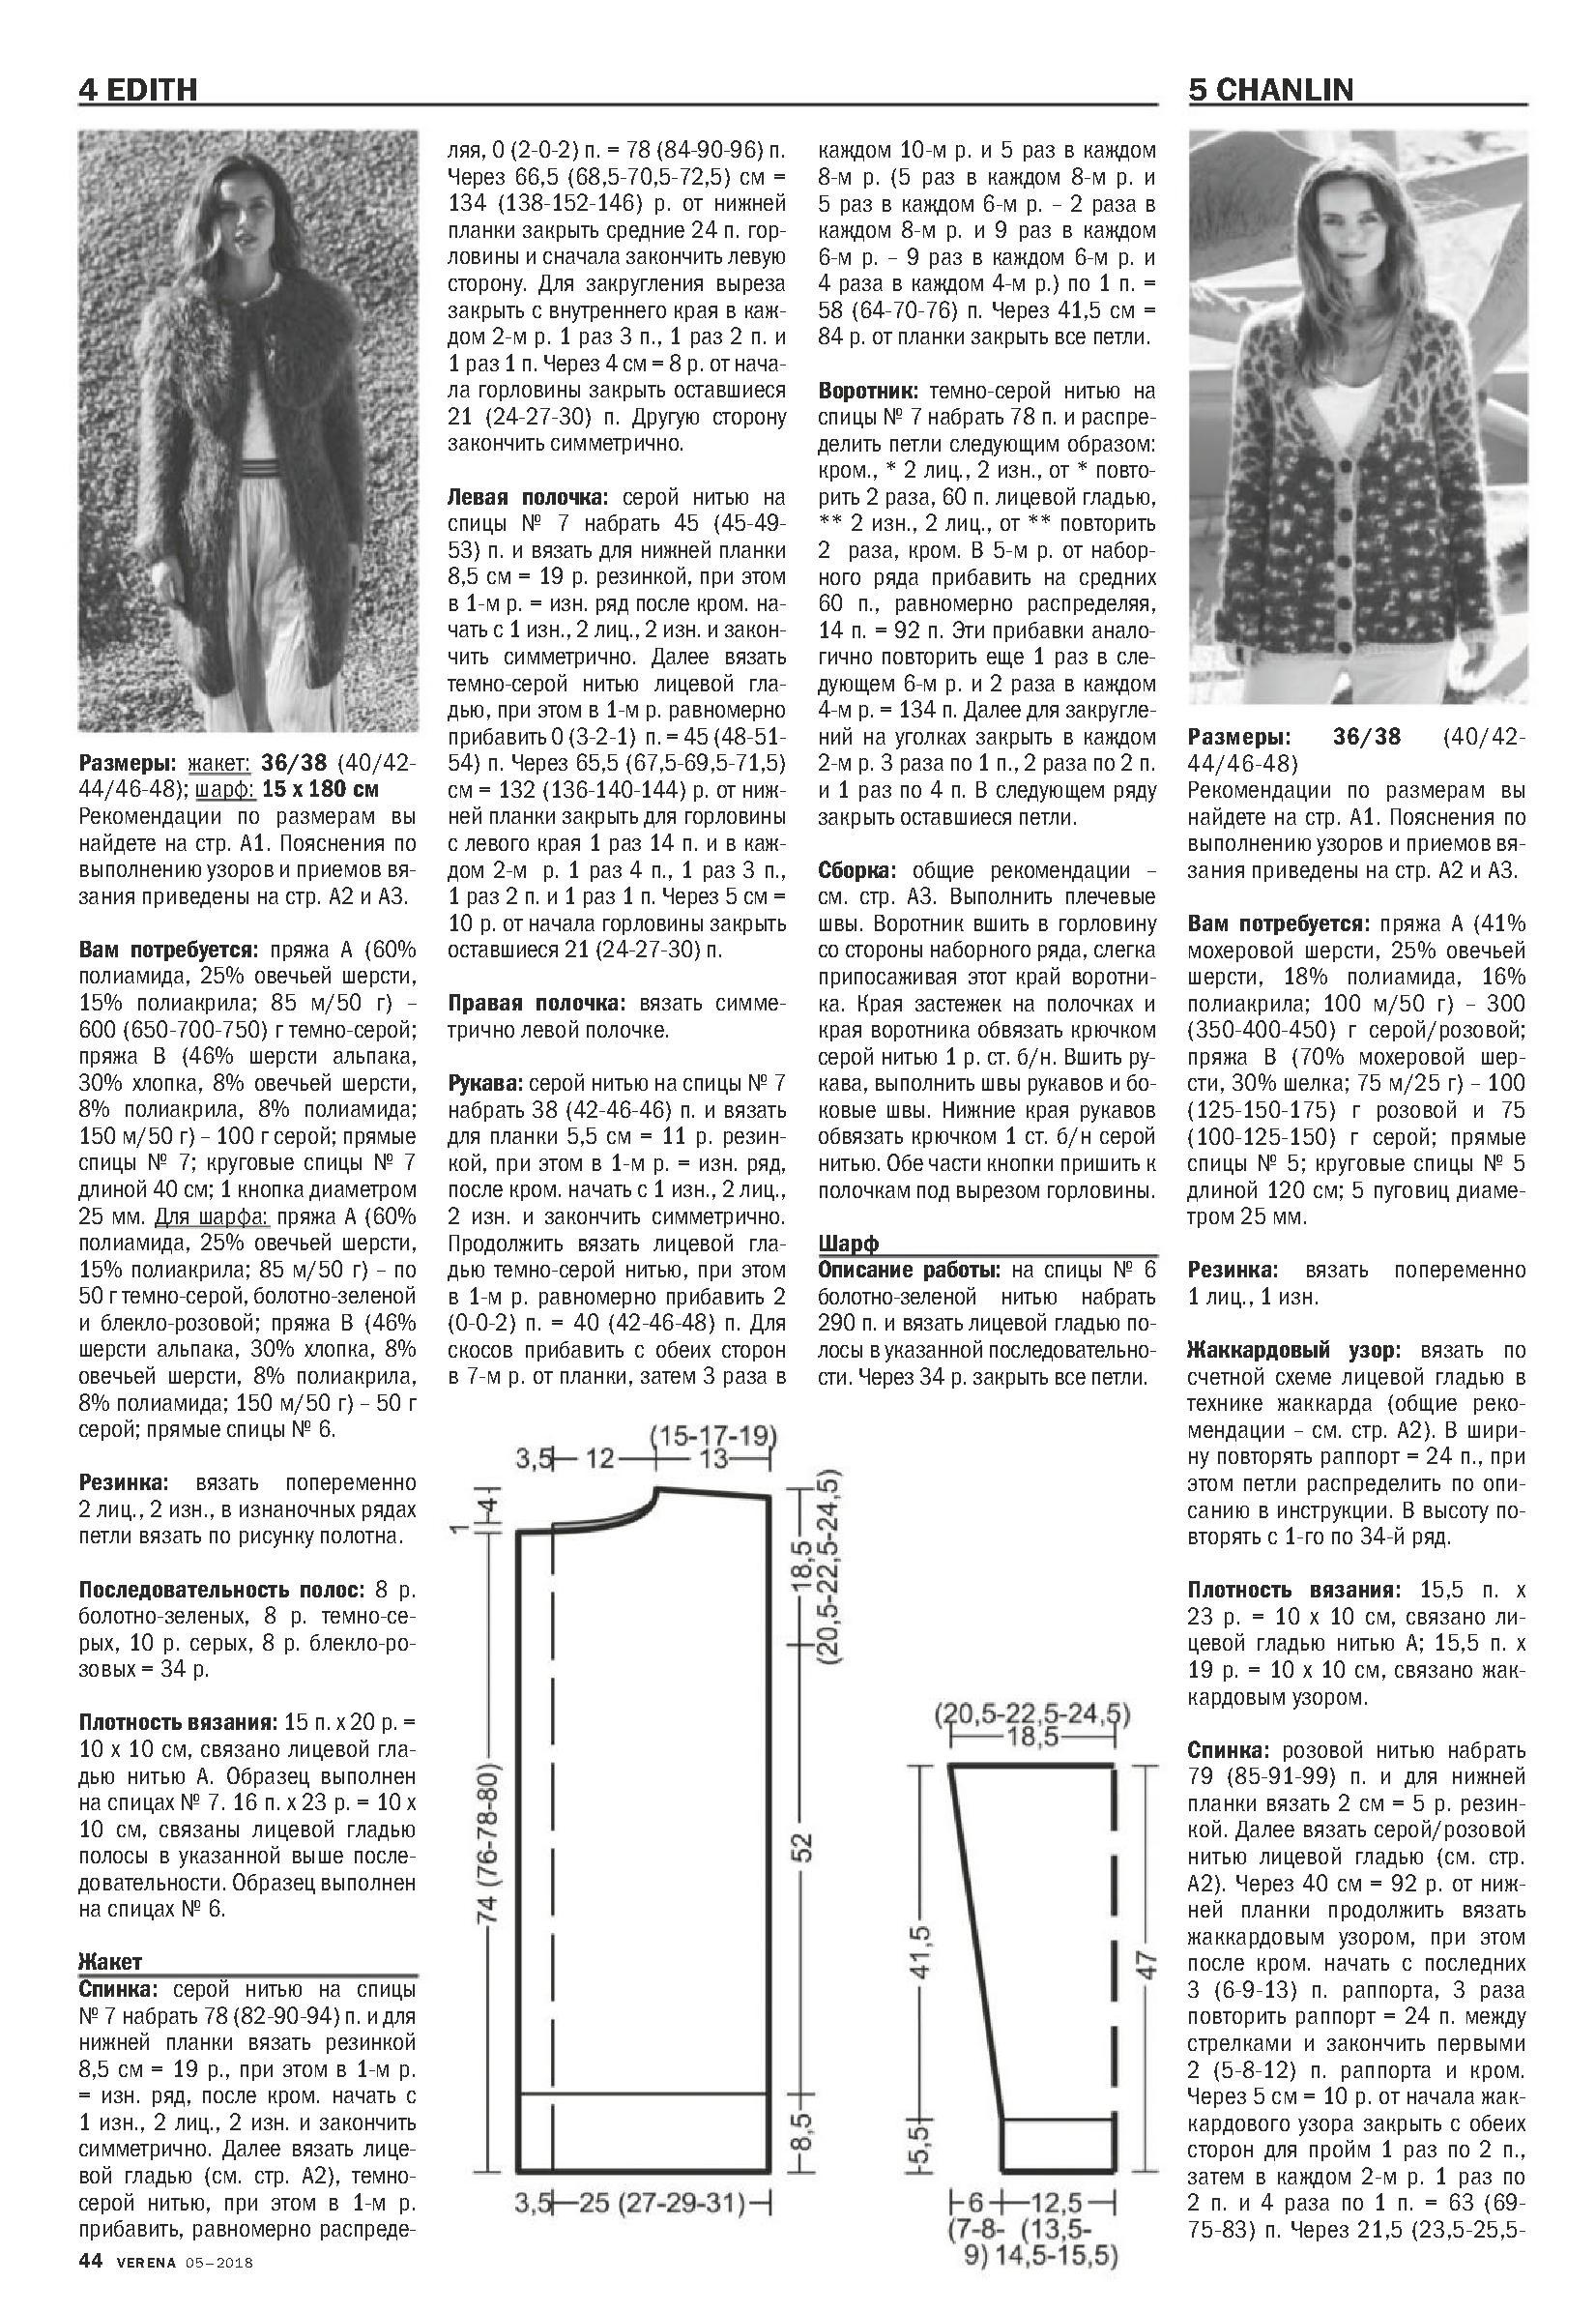 Page_00045c63f4a127fc4cb45.jpg